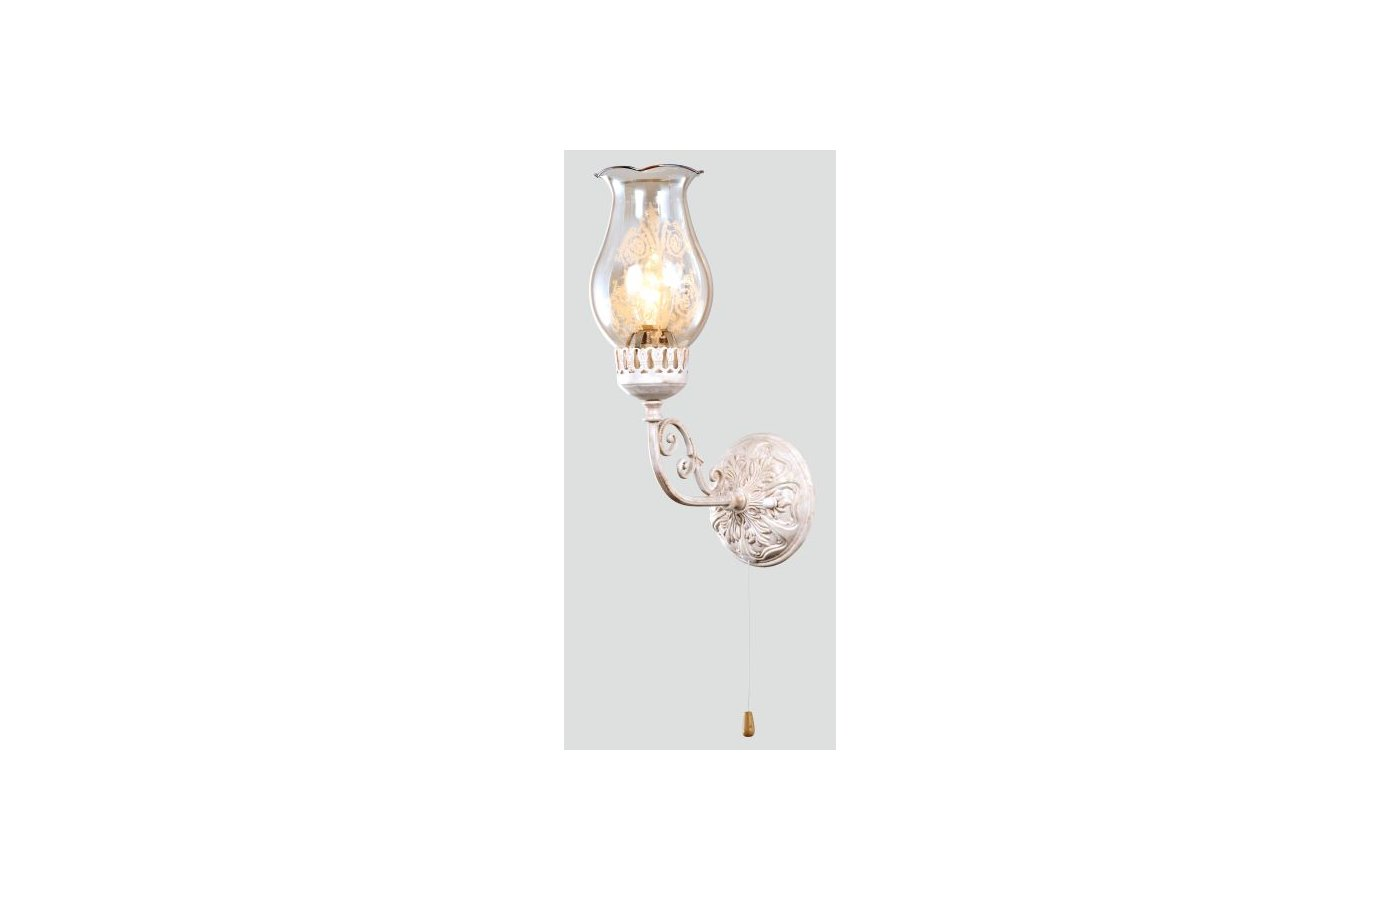 Декоративный светильник Rivoli Ada-W-1хE14-60W-Аntique white